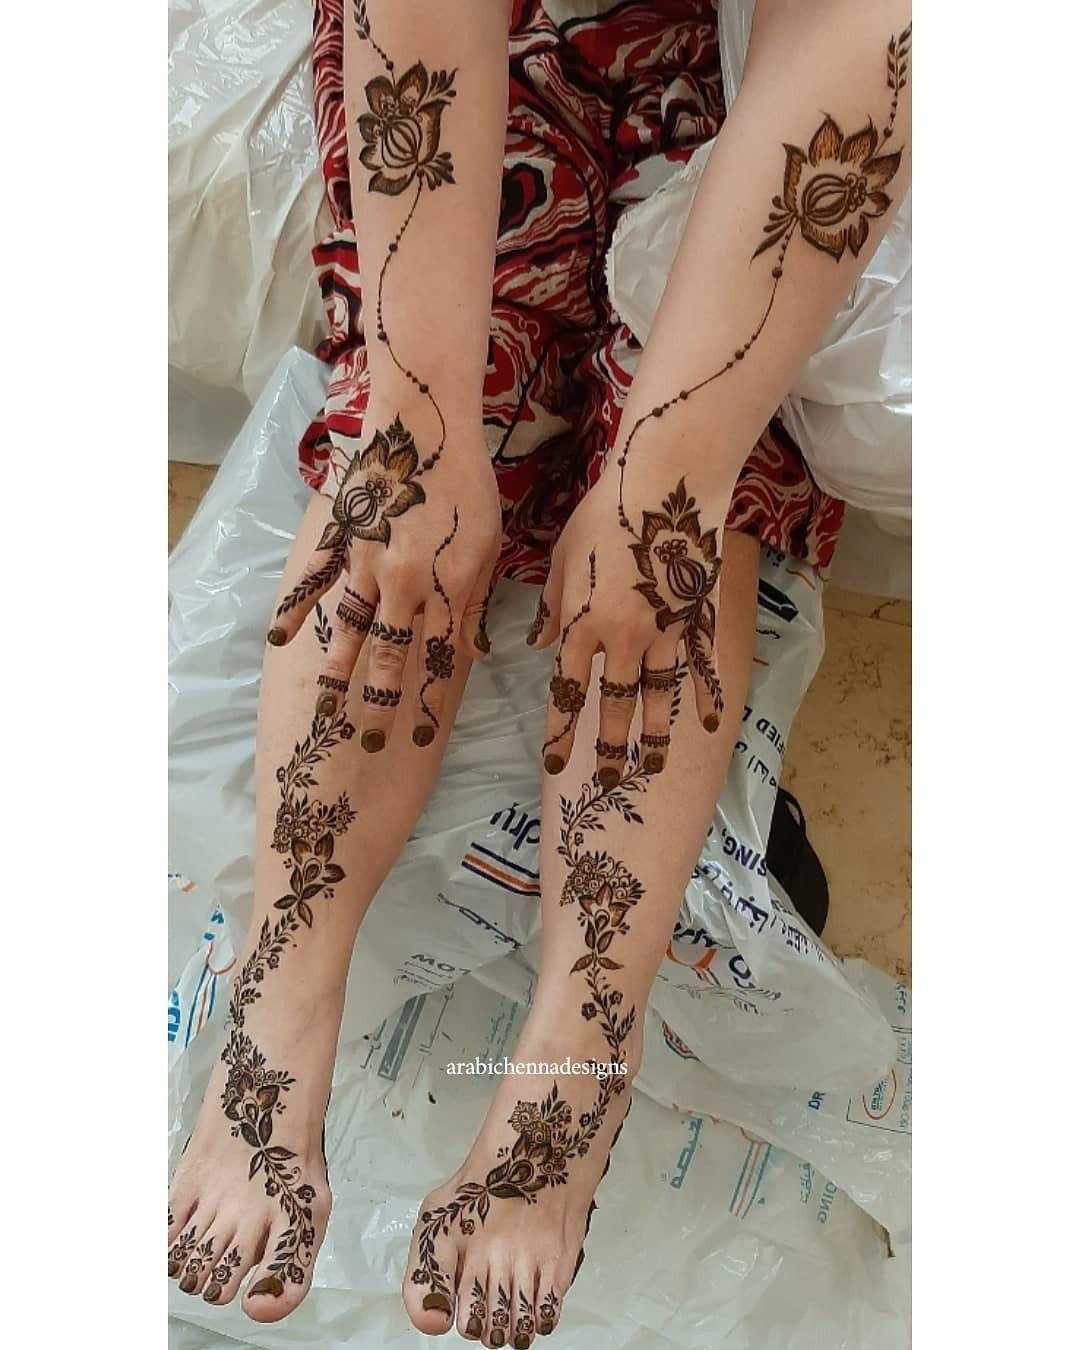 Henna artist in Dubai 0522531900 in 2020 Henna tattoo